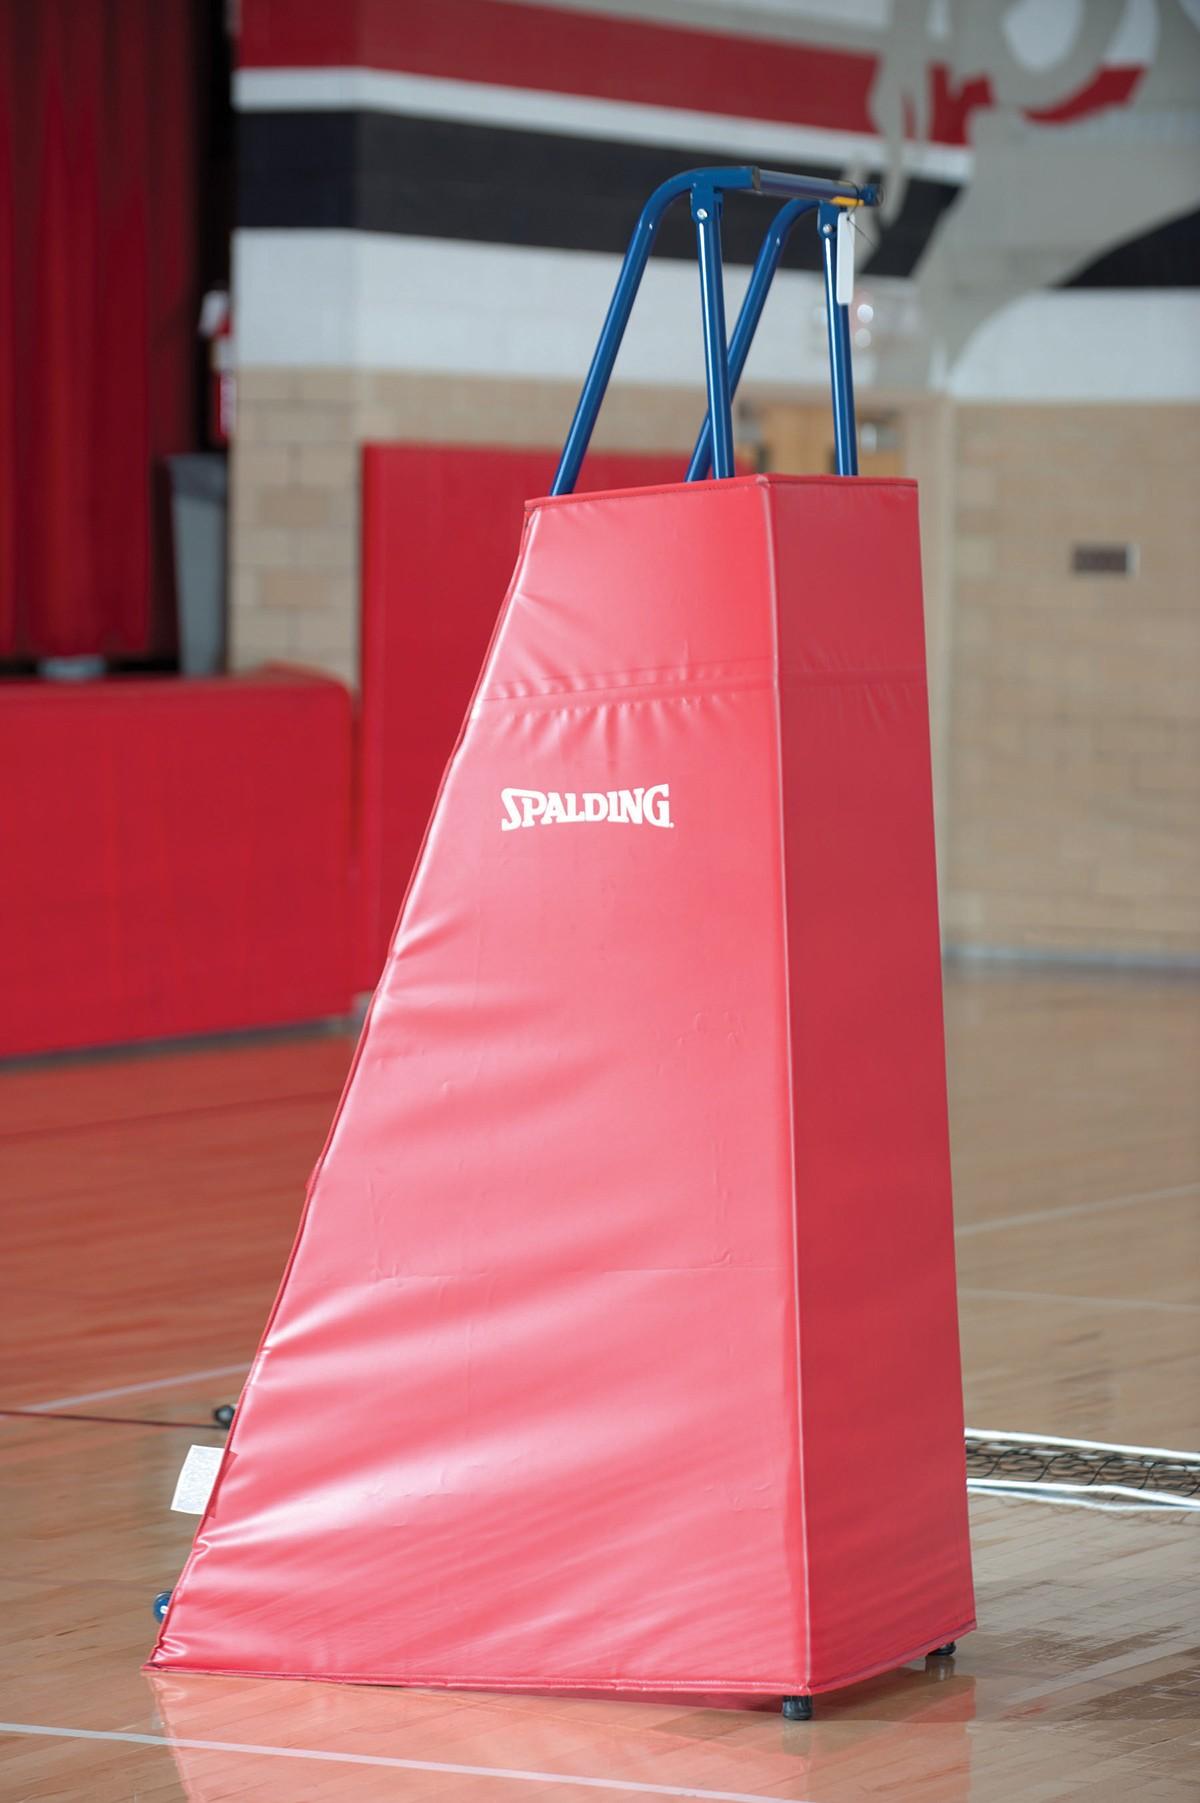 Spalding Fs200 Volleyball Referee Platform Padding